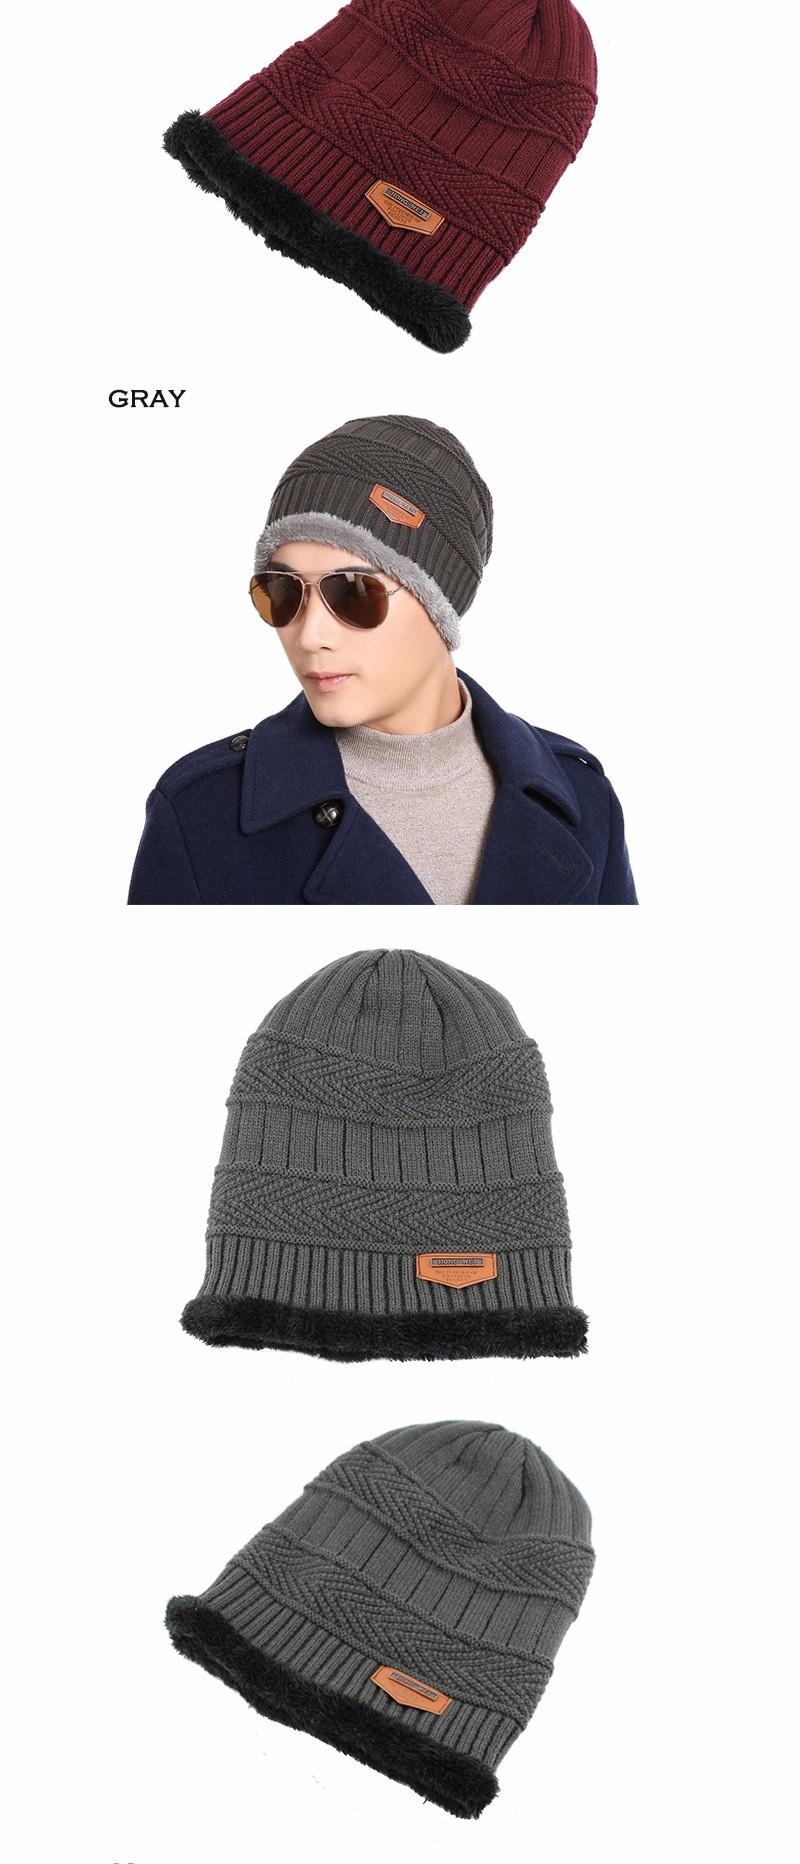 FETSBUY Pure Color Winter Skullies Beanies Hat Knit Winter Hat For Man Warm Hat Velvet Cap Bonnet Toucas Inverno Knitted Hats 17